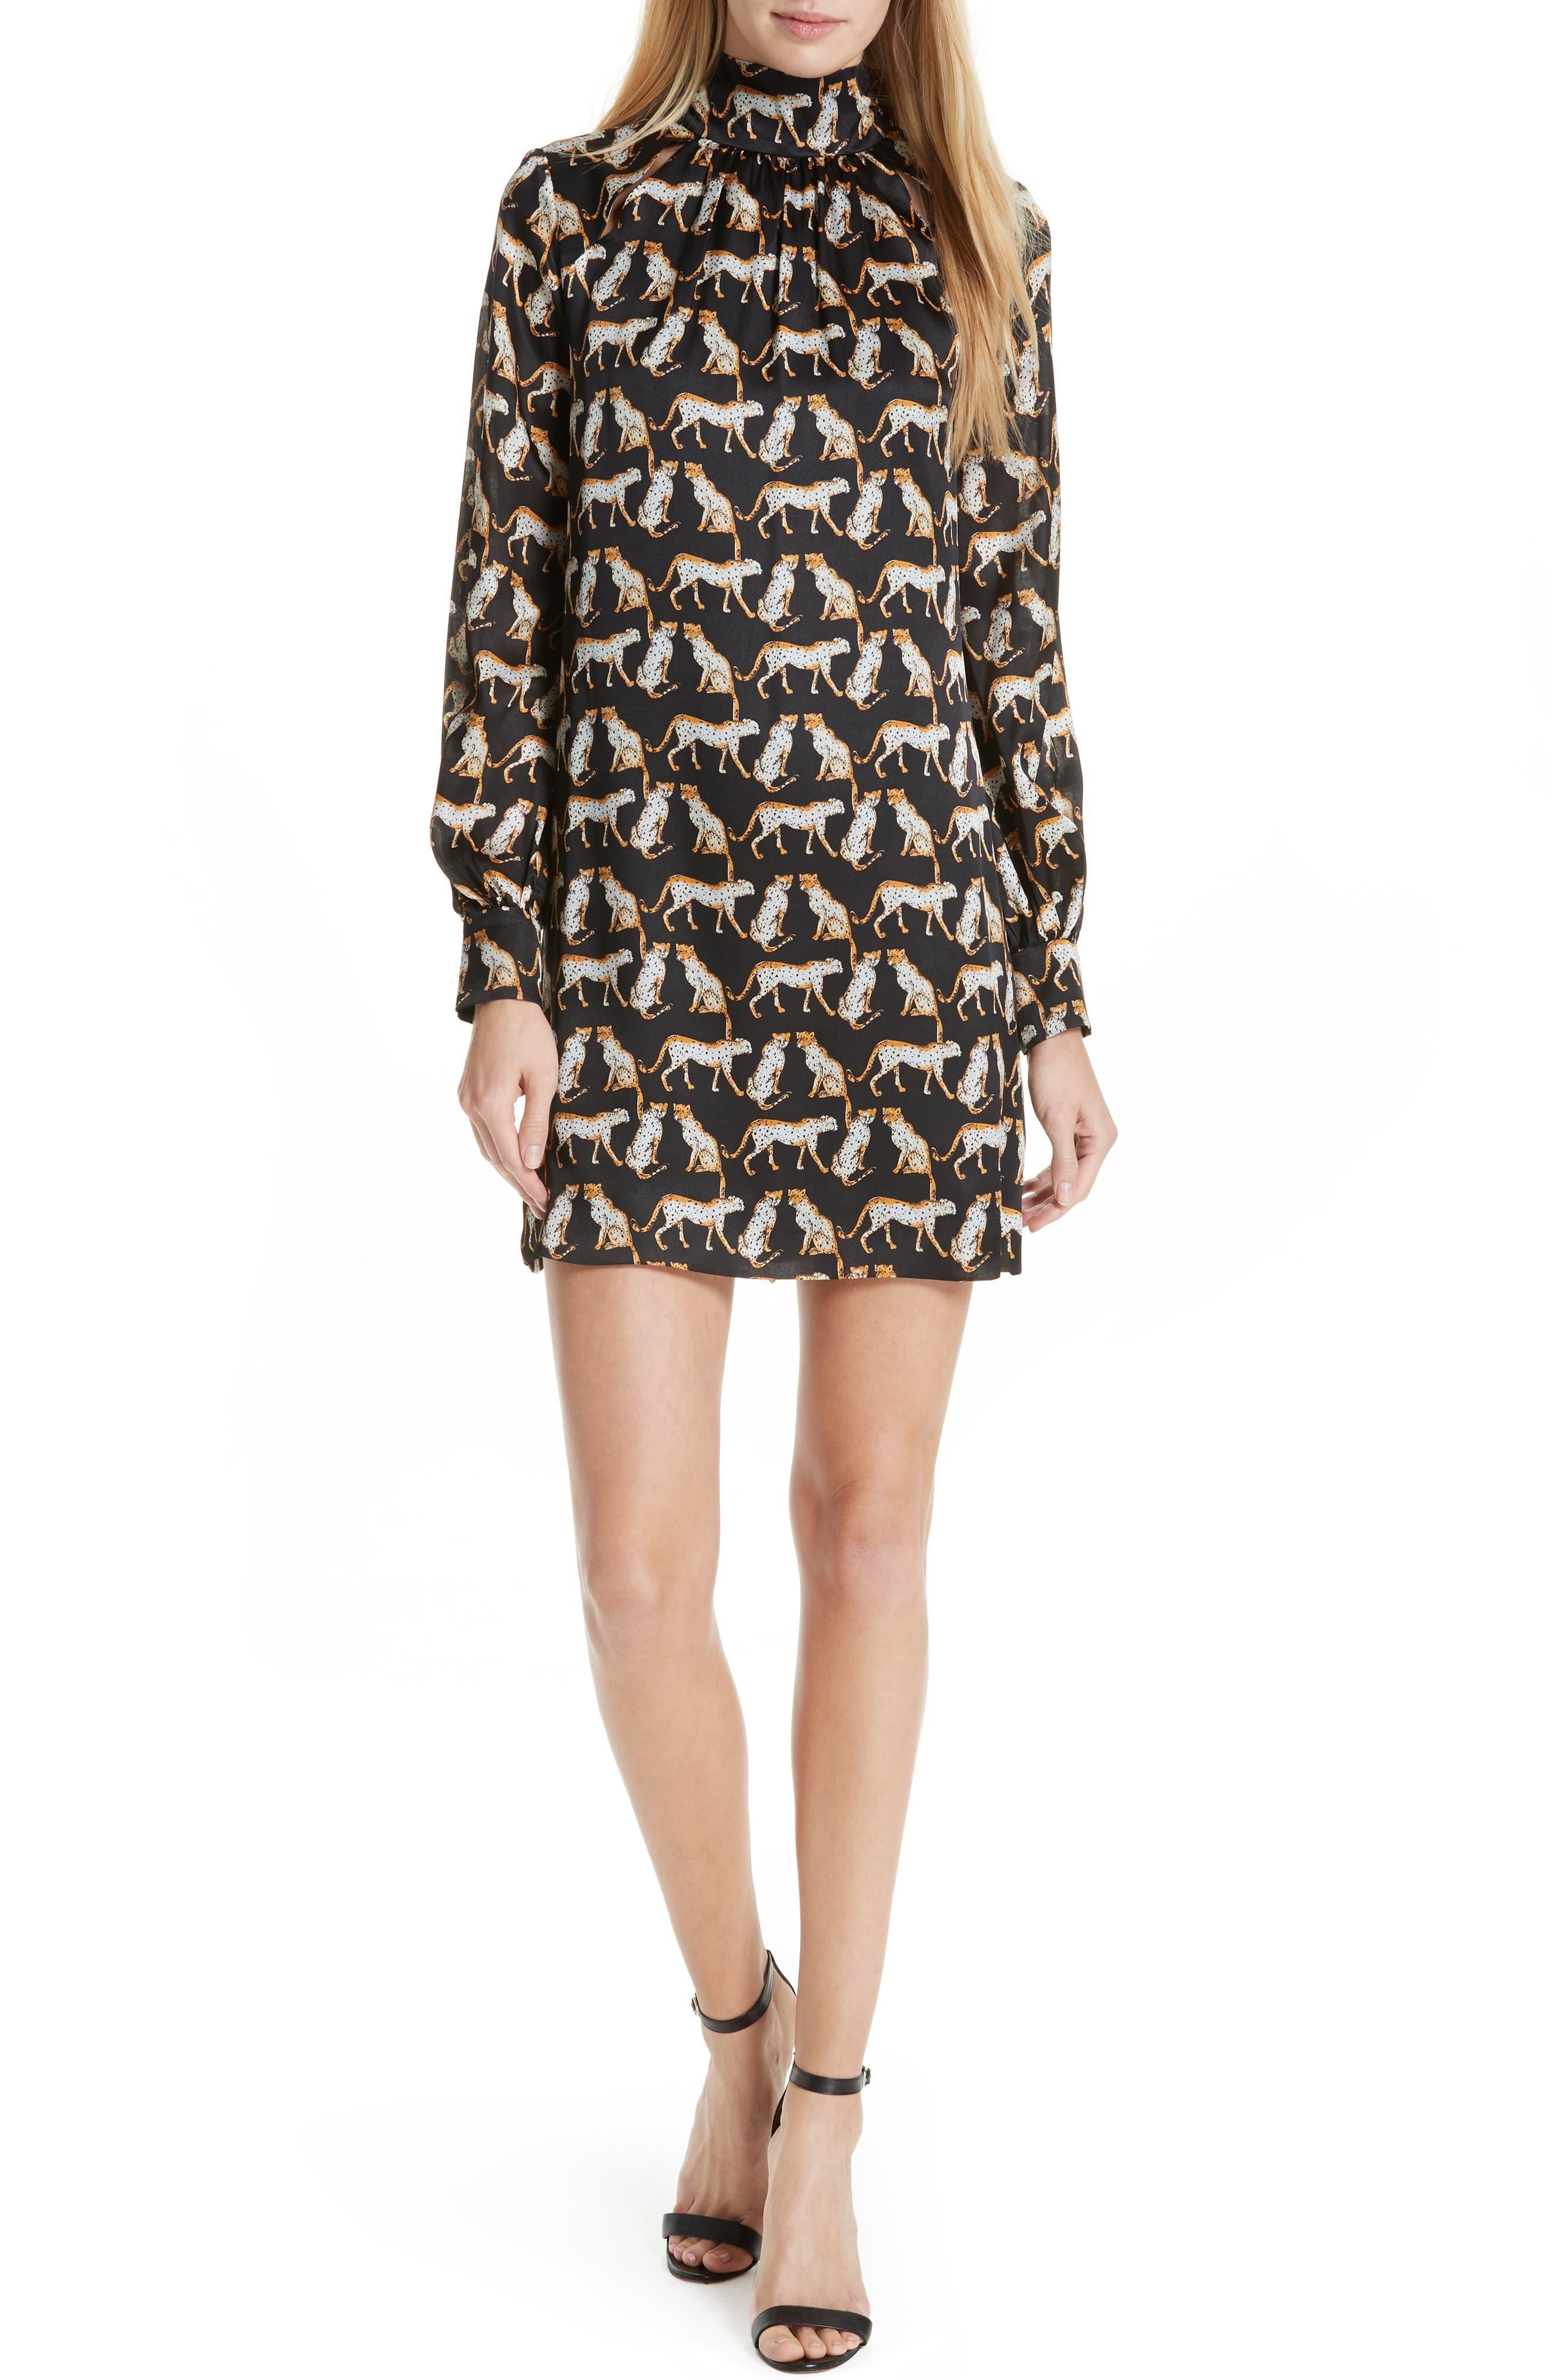 MILLY Cheetah Print High Neck Silk Dress, Main, color, 001